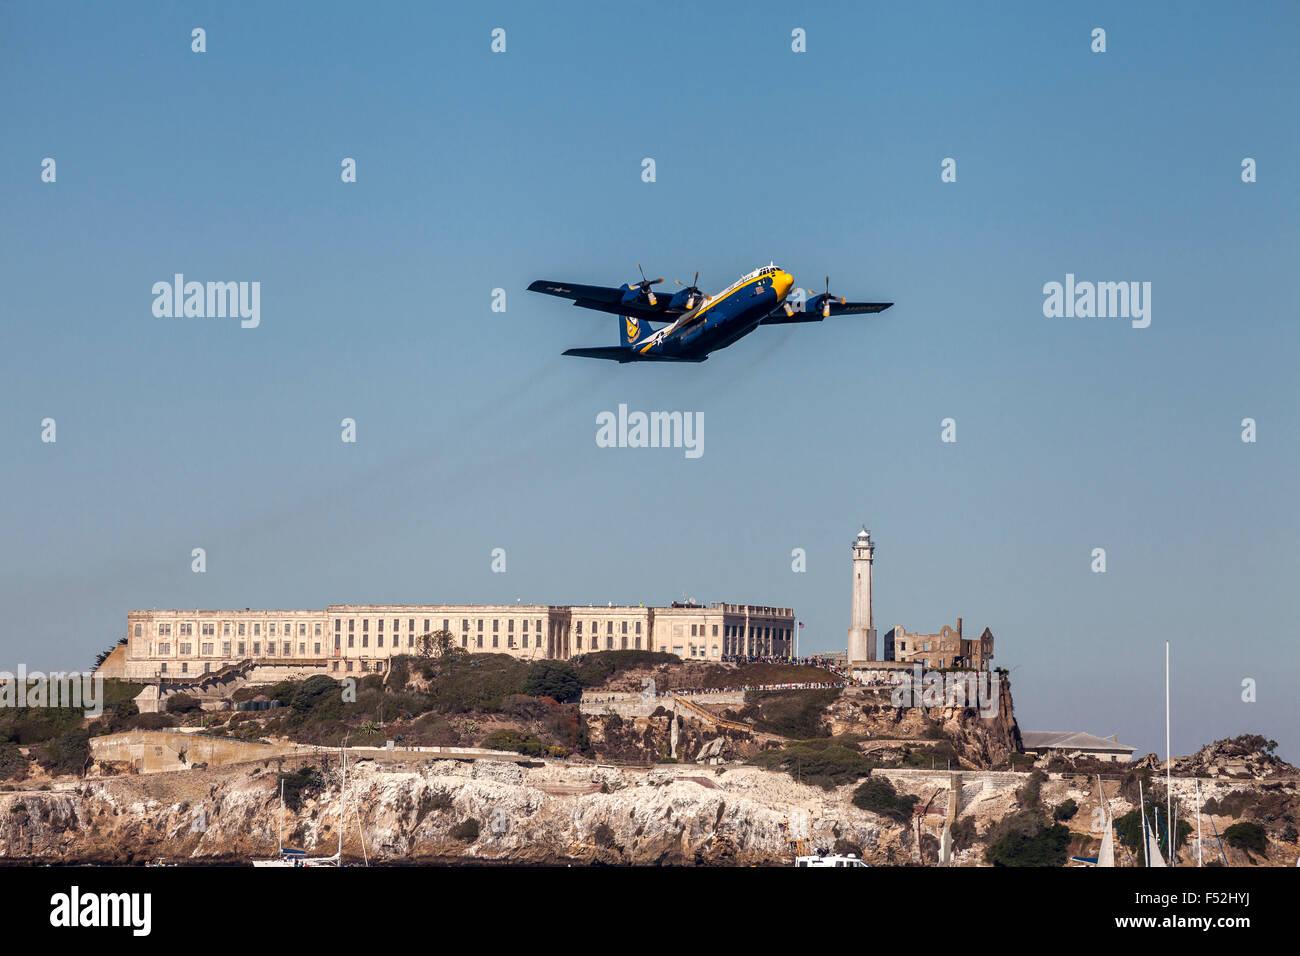 US Marine Corps C-130T Hercules nicknamed Fat Albert flying over Alcatraz during Fleet Week 2015, San Francisco, - Stock Image